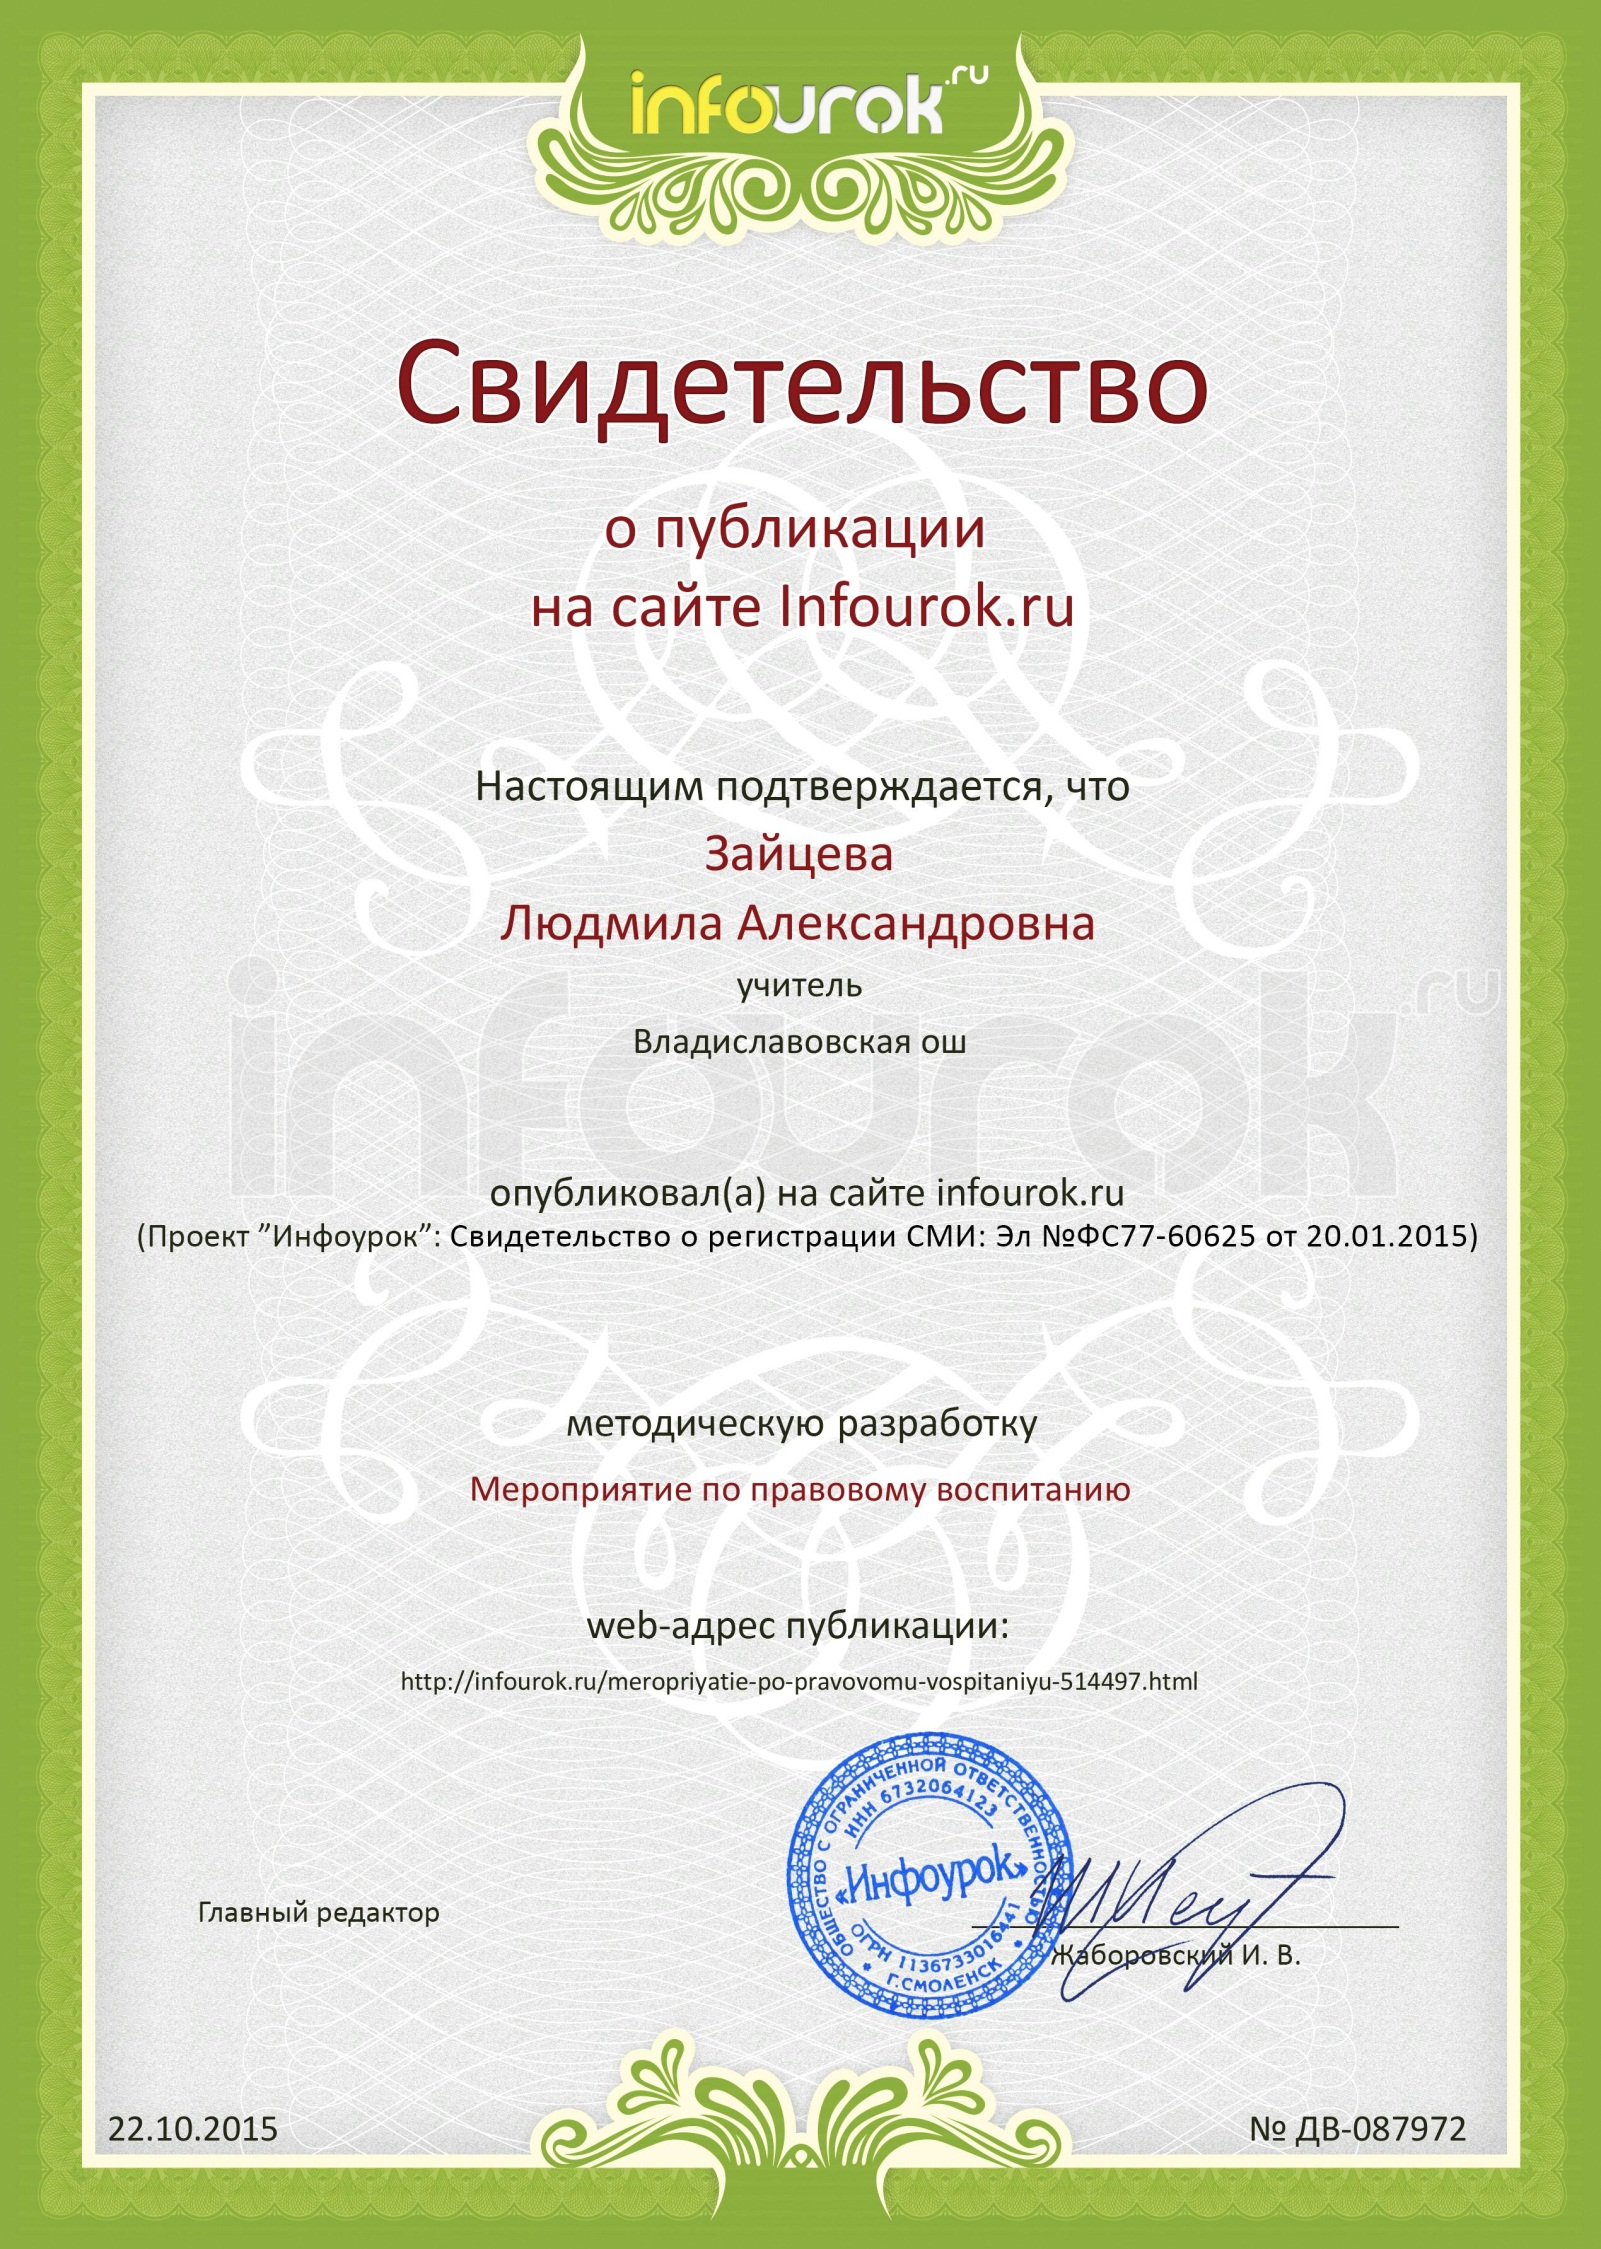 D:\МАМА\паспорта русские\аттестация\Сертификат проекта Infourok.ru № ДВ-087972.jpg